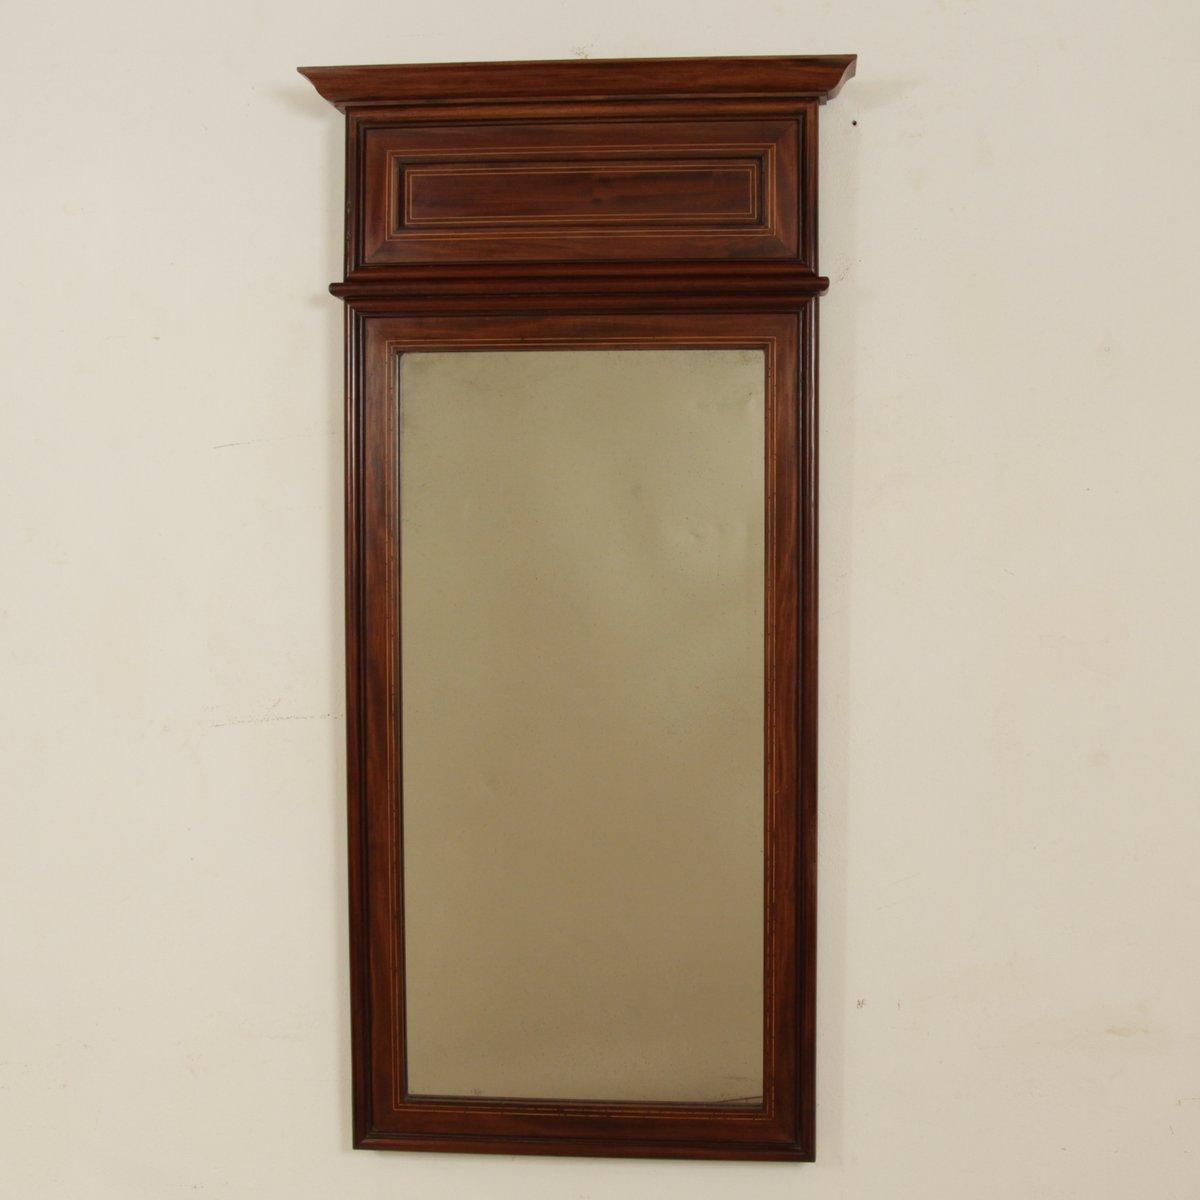 gro er mahagoni empire spiegel 1810er bei pamono kaufen. Black Bedroom Furniture Sets. Home Design Ideas